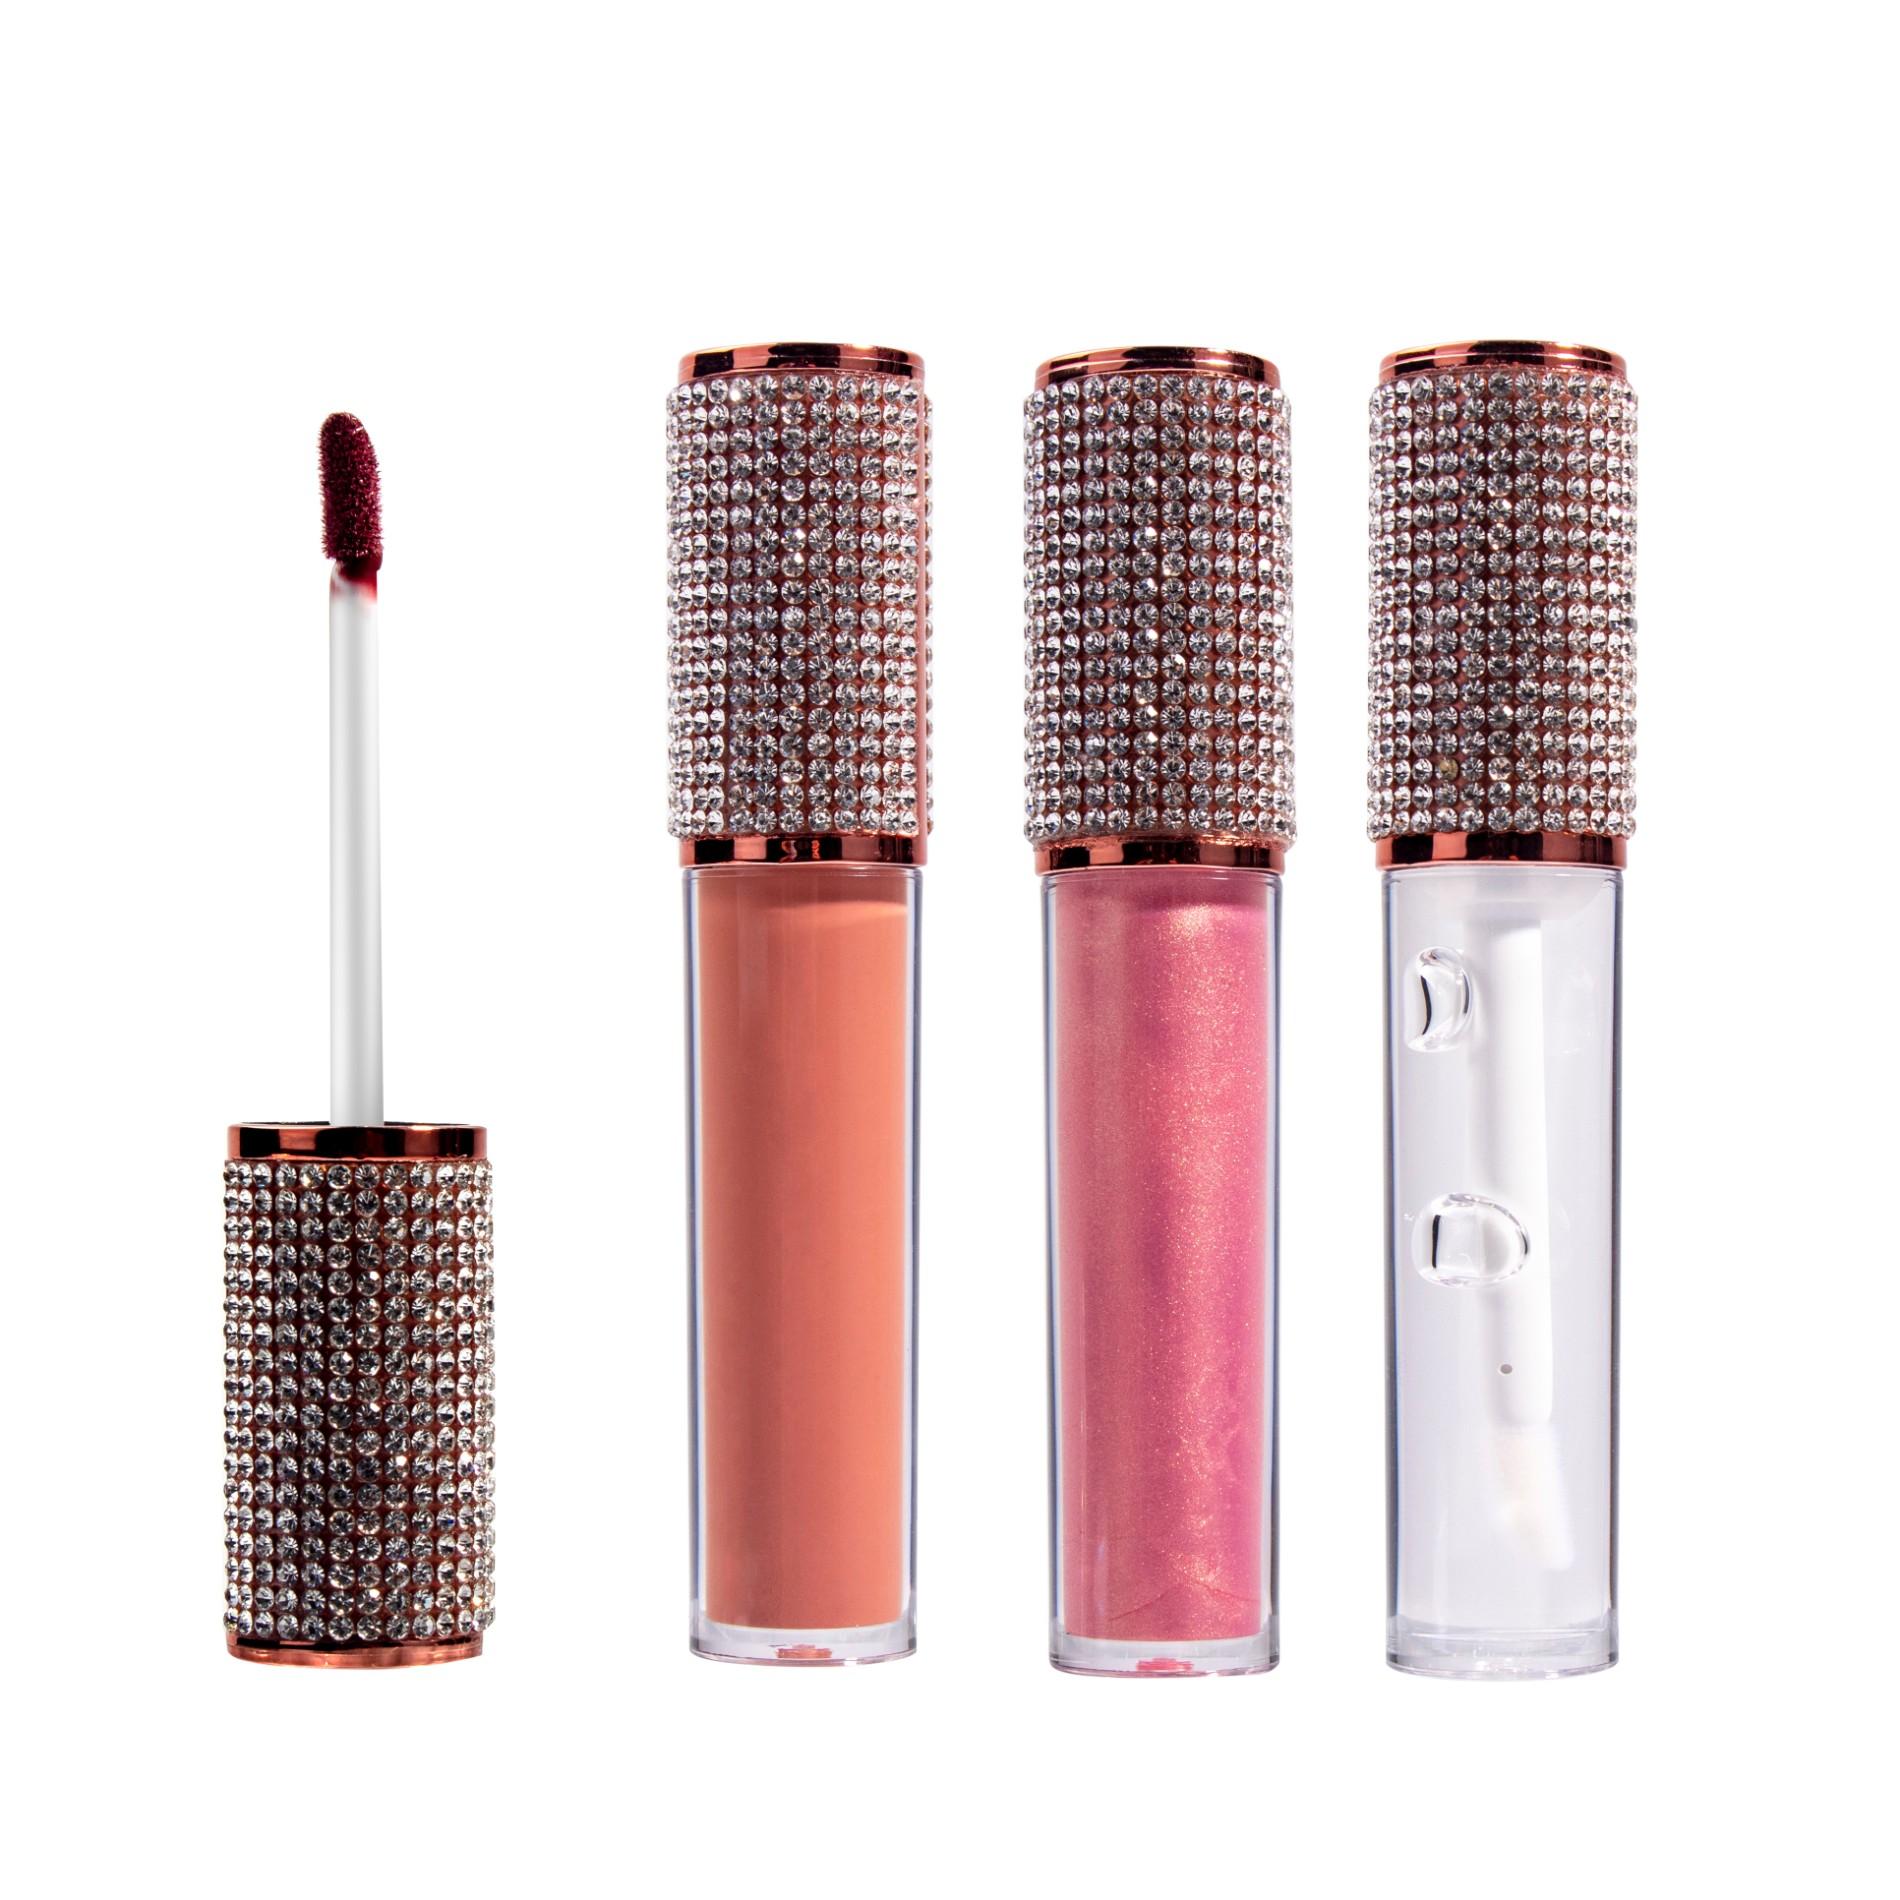 Long Lasting Diamond Lipgloss Manufacturers, Long Lasting Diamond Lipgloss Factory, Supply Long Lasting Diamond Lipgloss